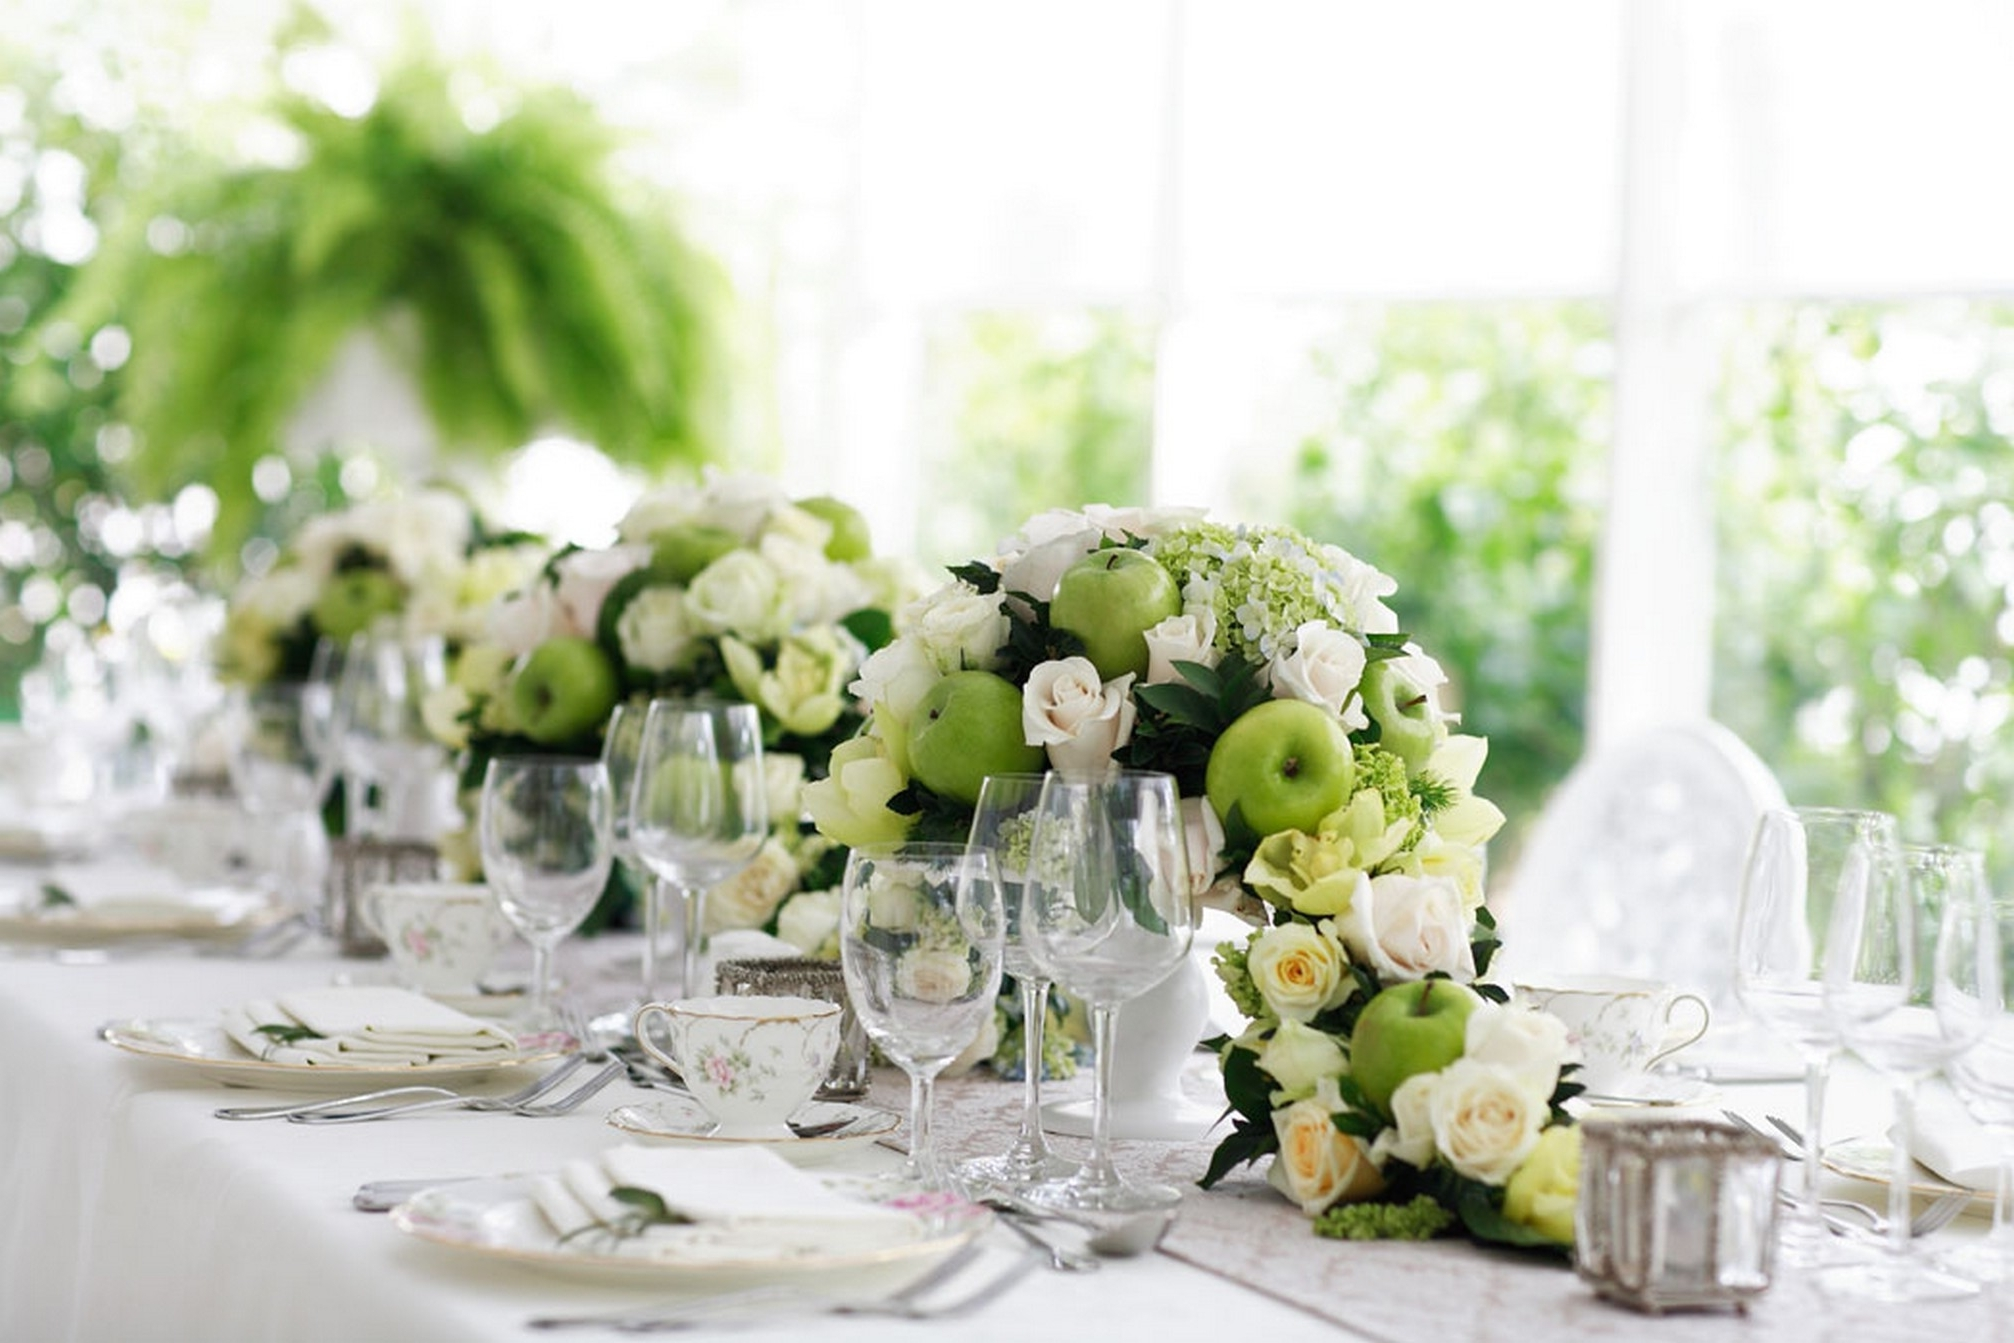 Wedding Table Flower Arrangements Ideas – Auroravine For 2017 Artificial Floral Arrangements For Dining Tables (View 22 of 25)